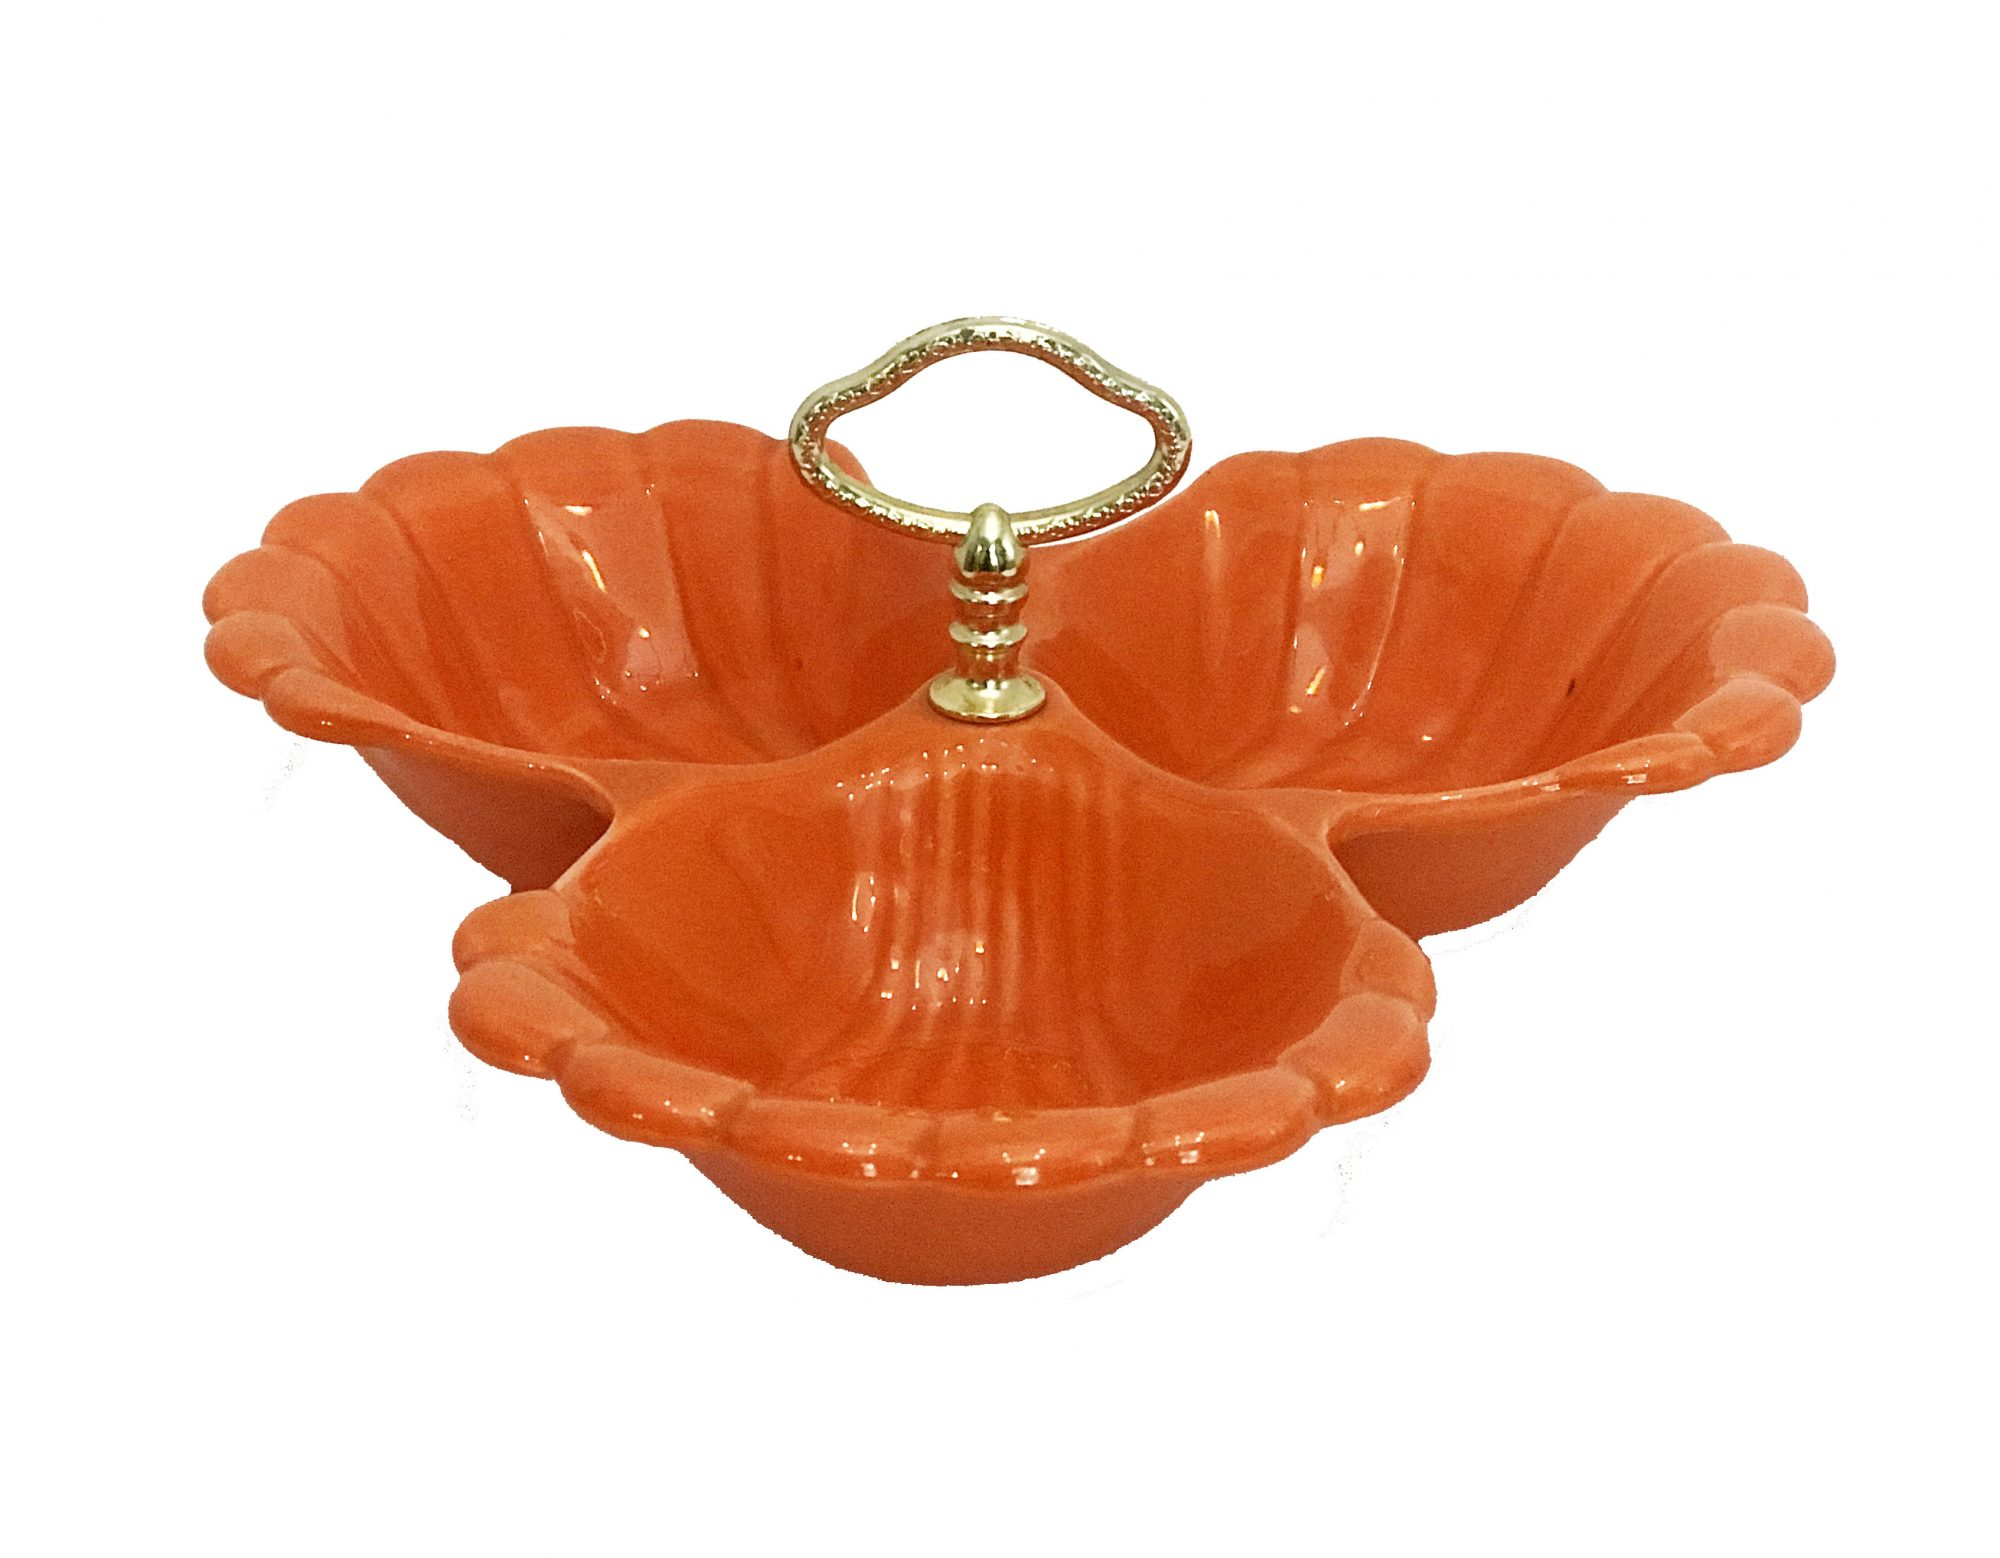 3-compartment-clam-shell-serving-dish-orange